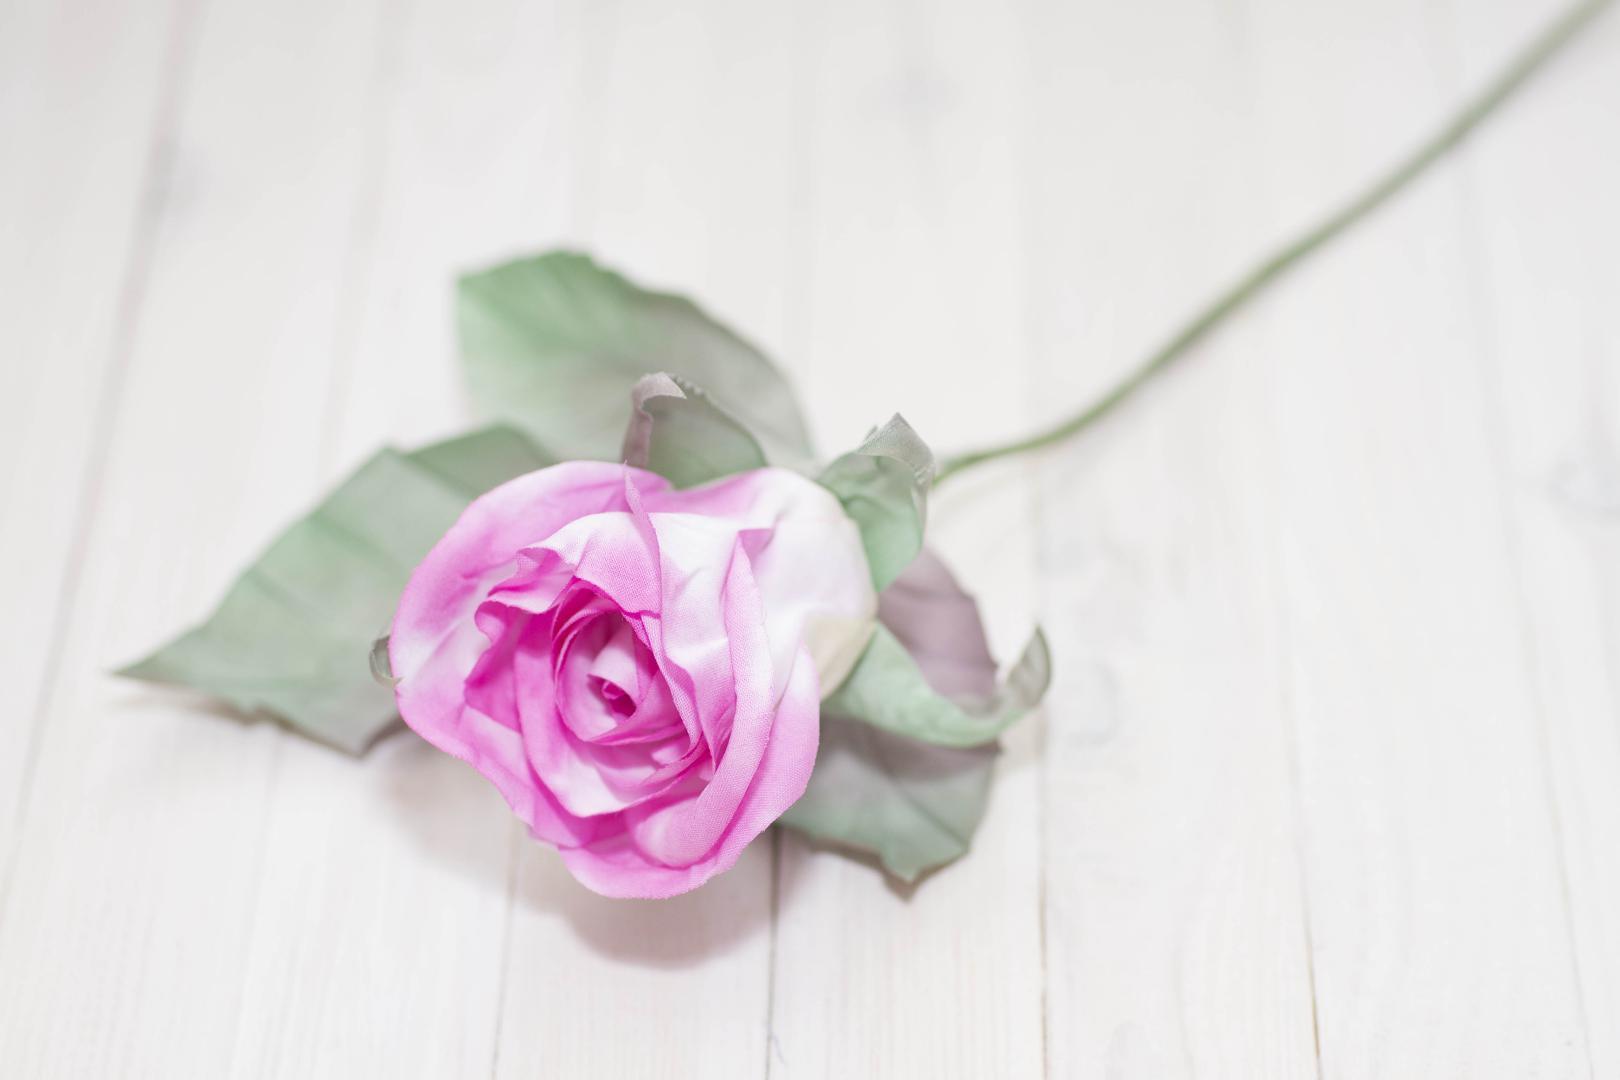 Flower materials kit bud rose pattern flowertools for Waste material flower making